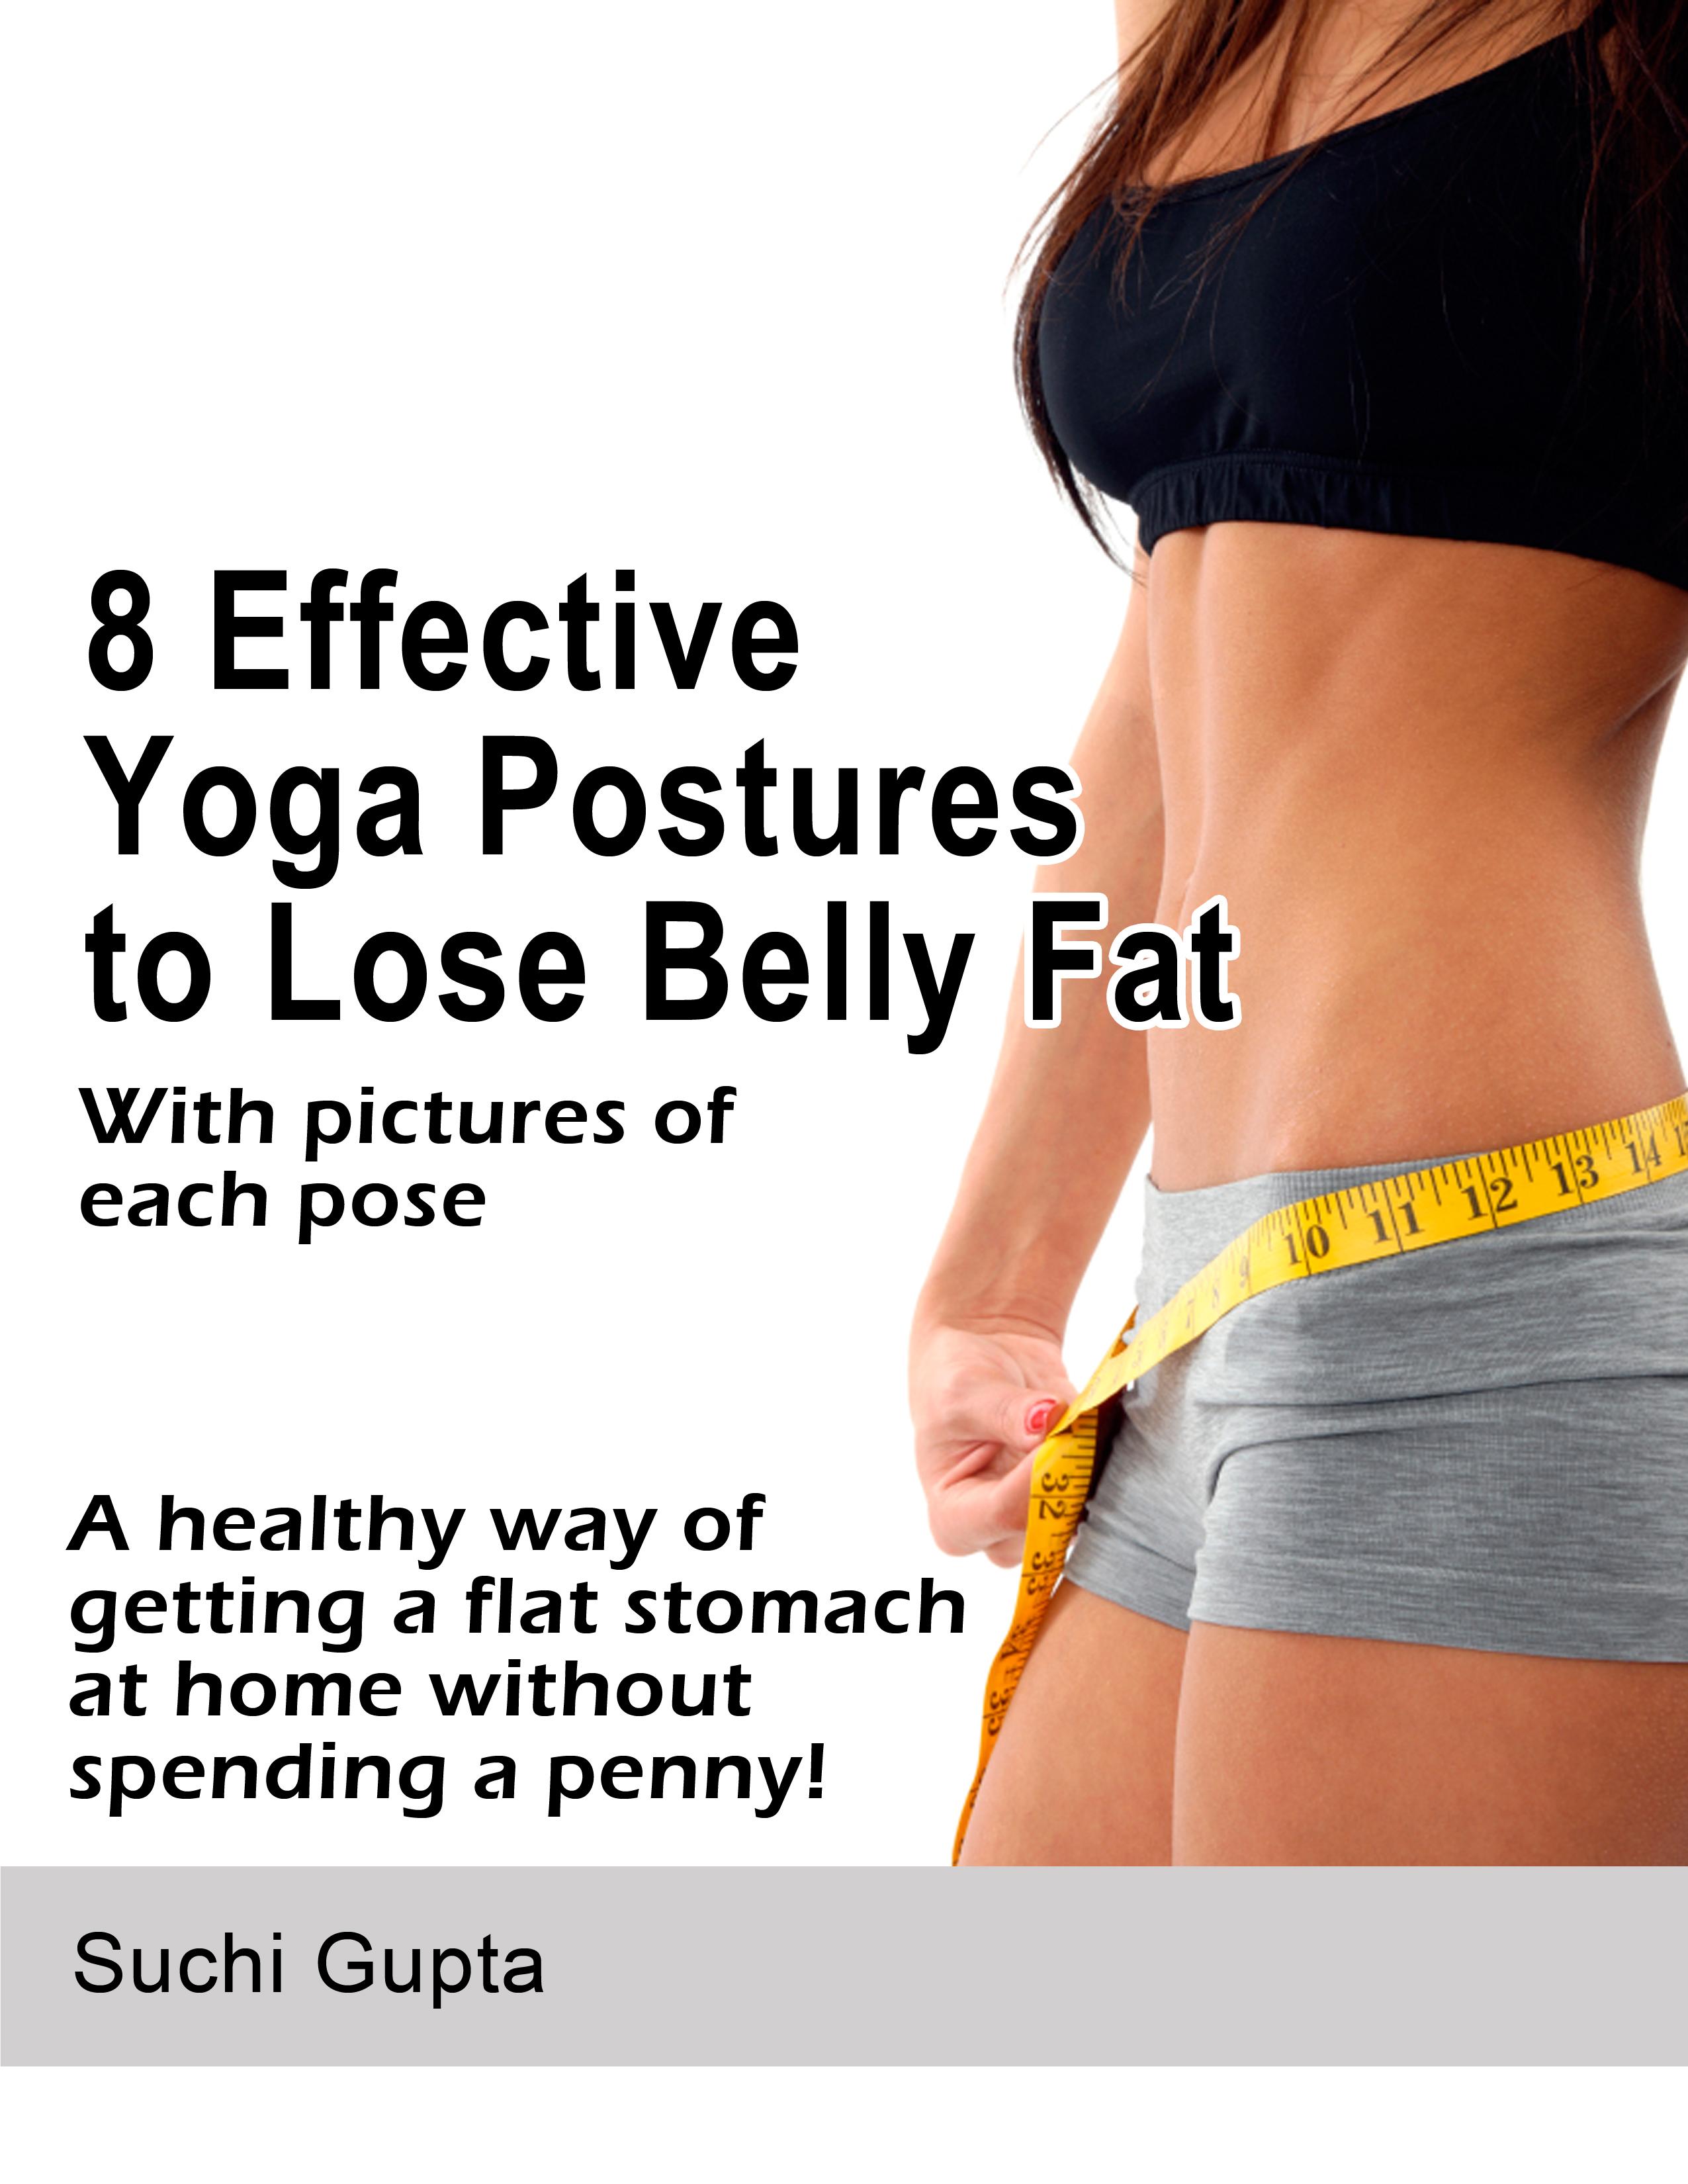 smashwords 8 effective yoga postures to lose belly fat